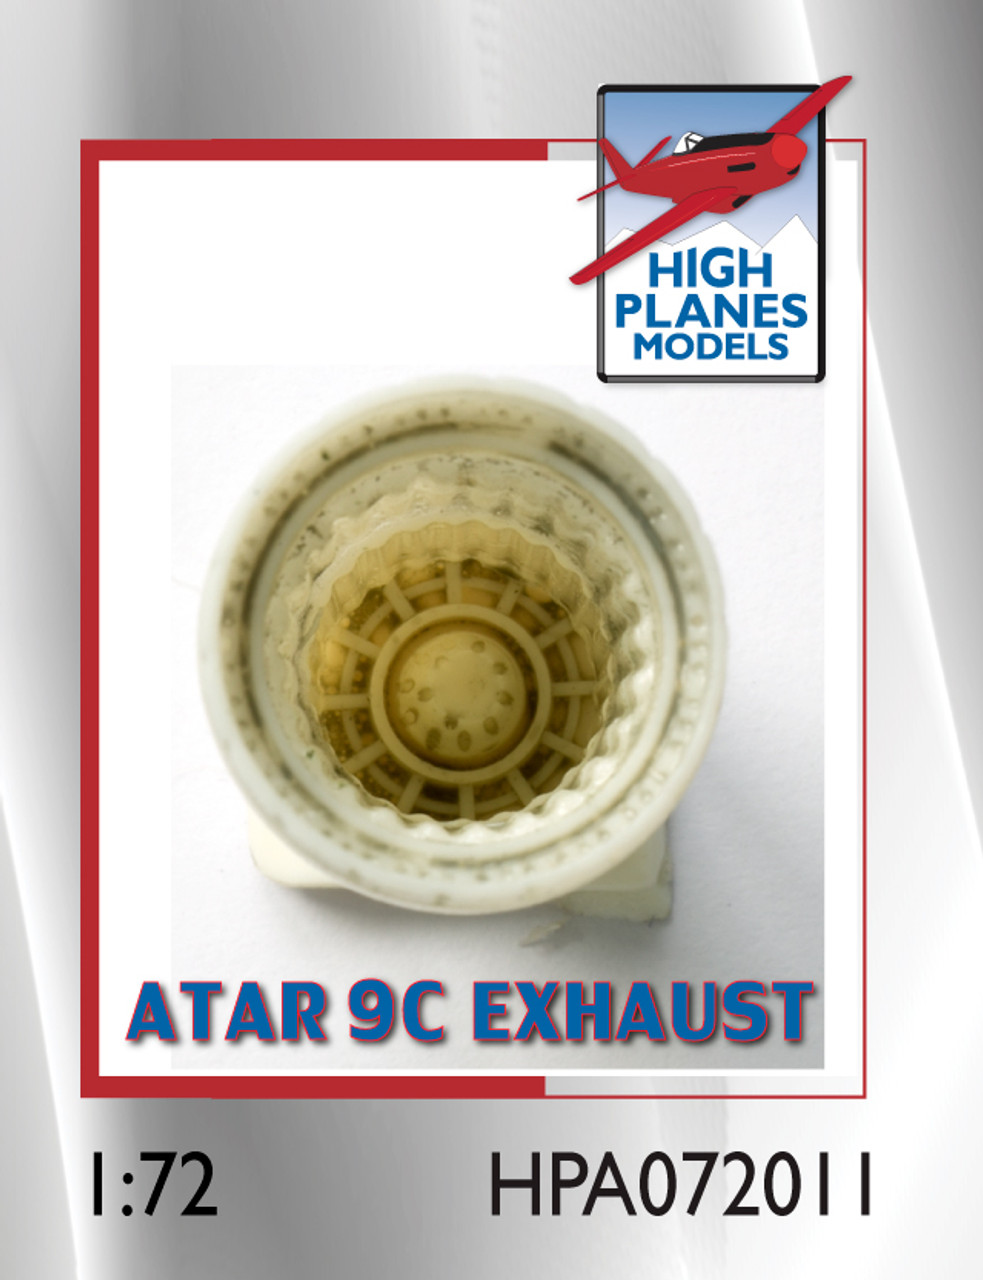 High Planes Dassault Mirage IIIE O Atar 9C exhaust pipe Accessories 1:72